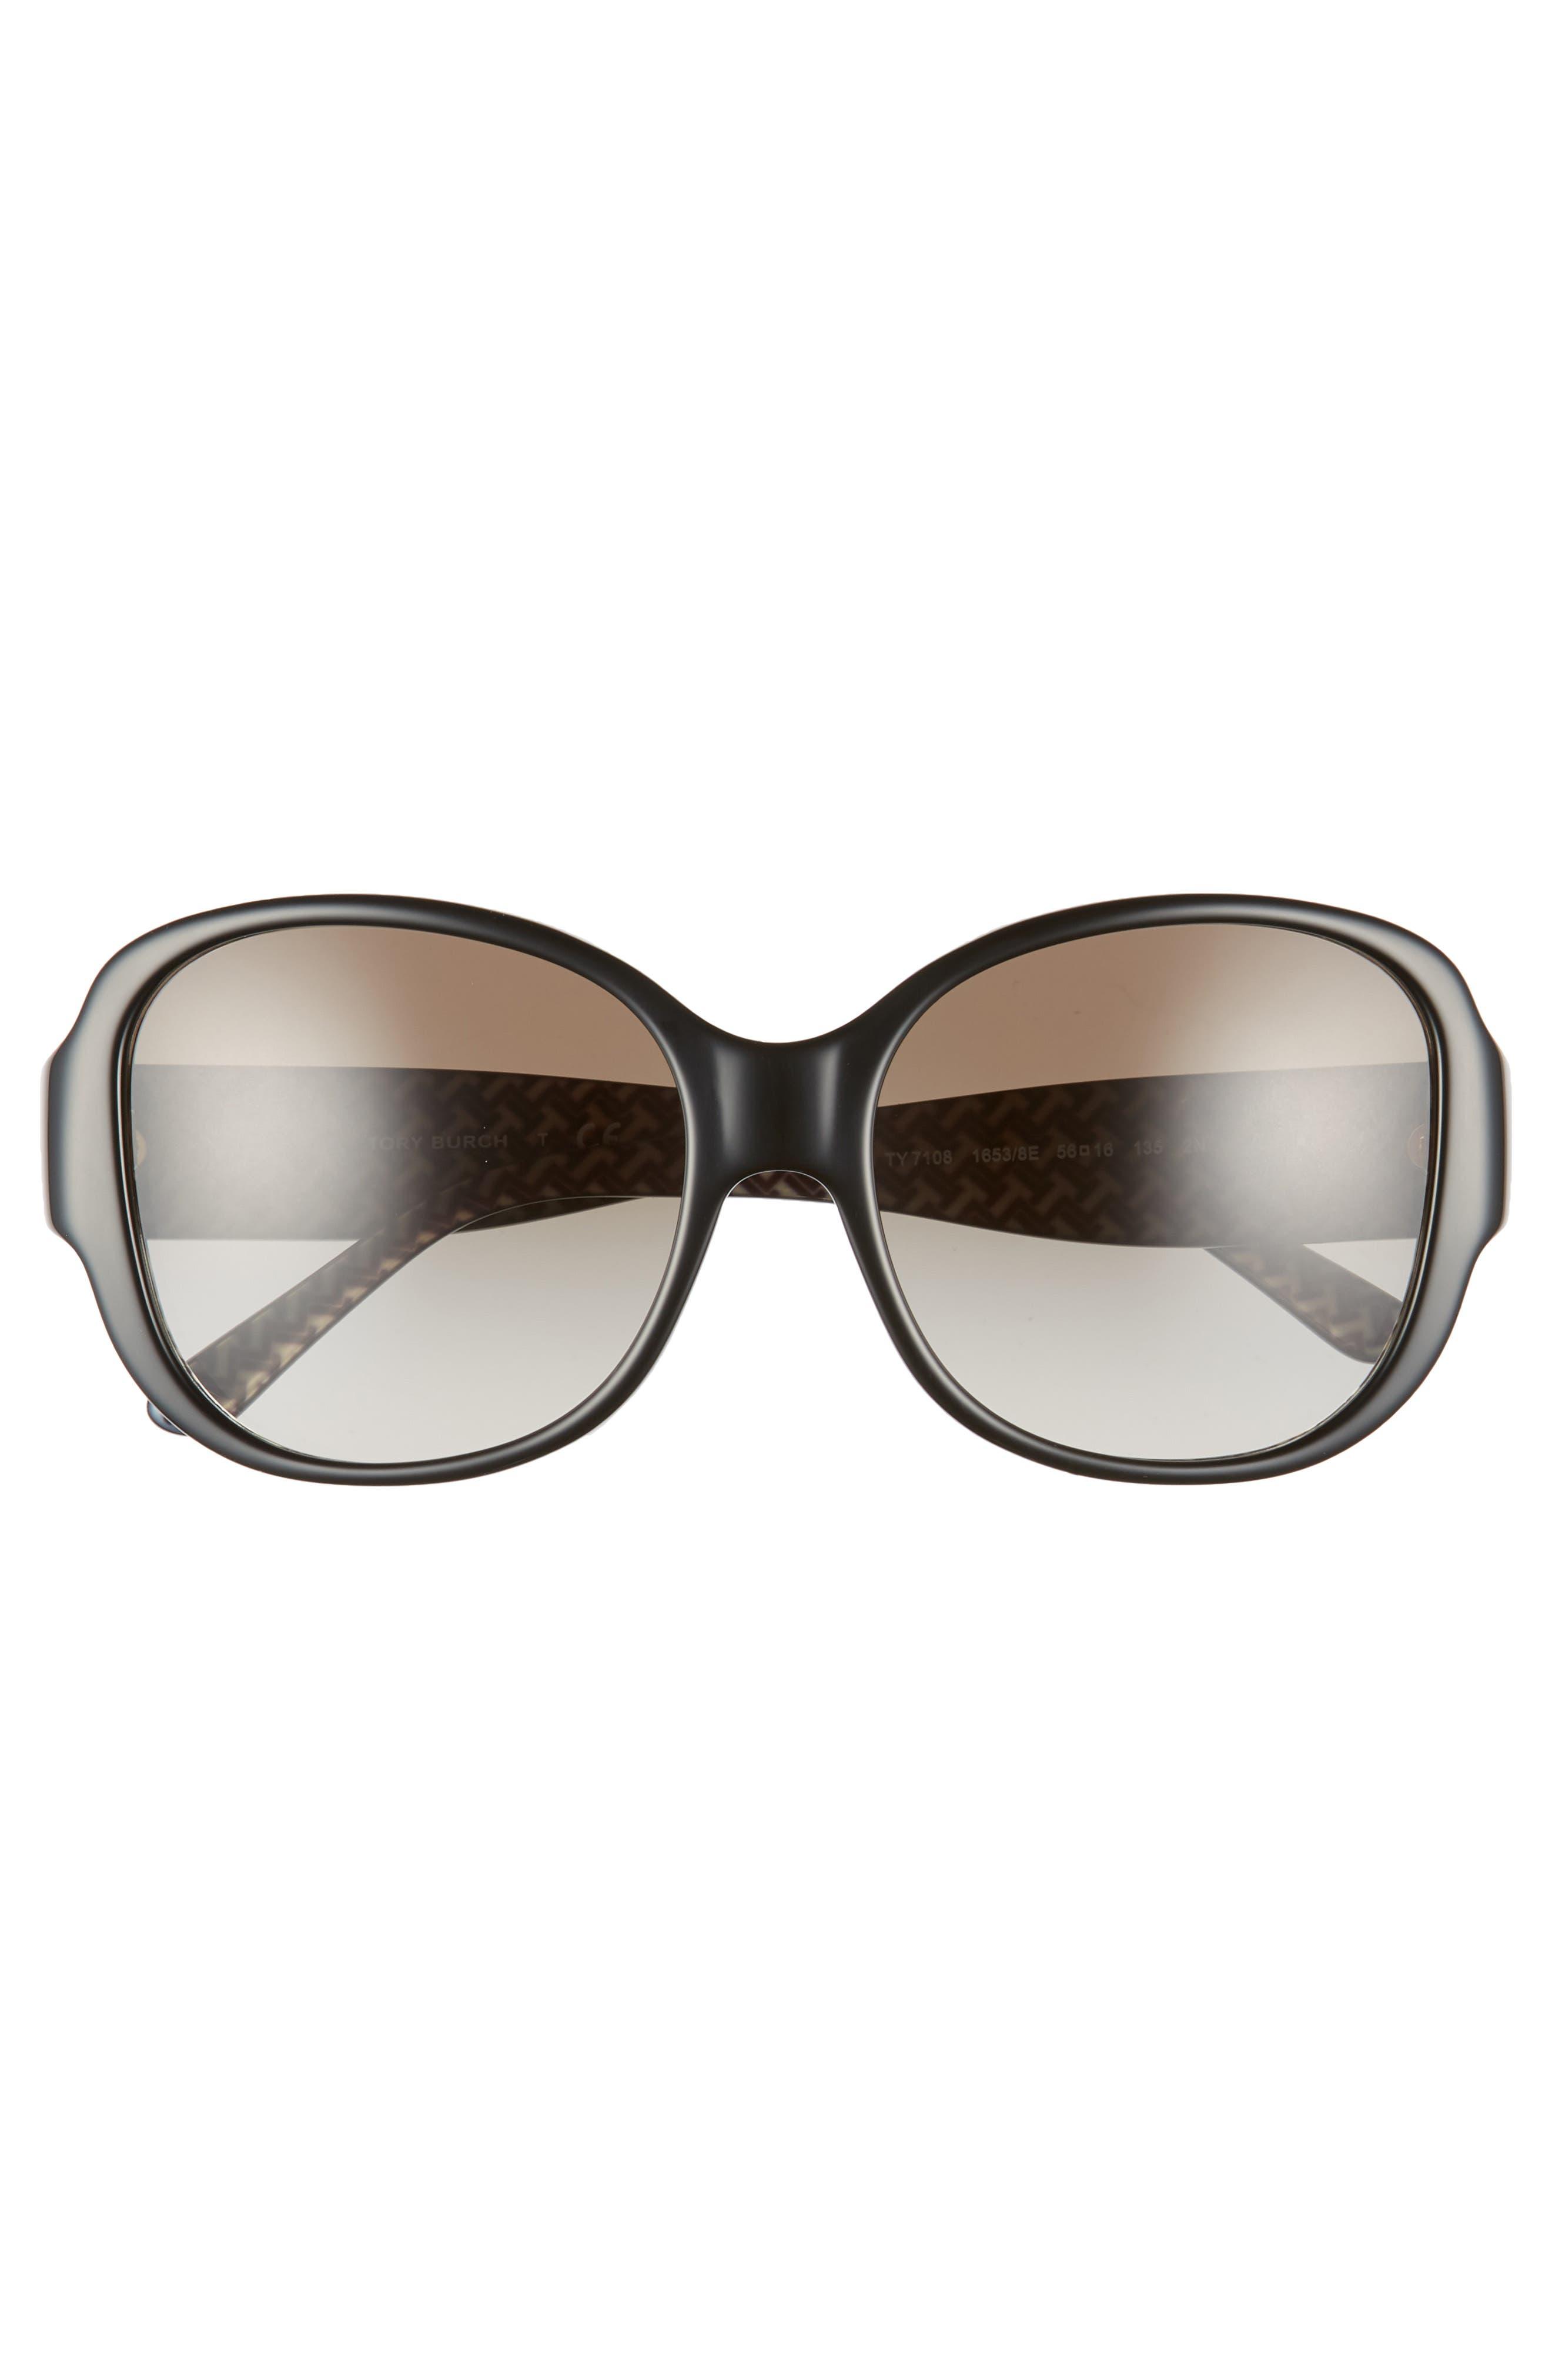 56mm Gradient Retro Sunglasses,                             Alternate thumbnail 3, color,                             009